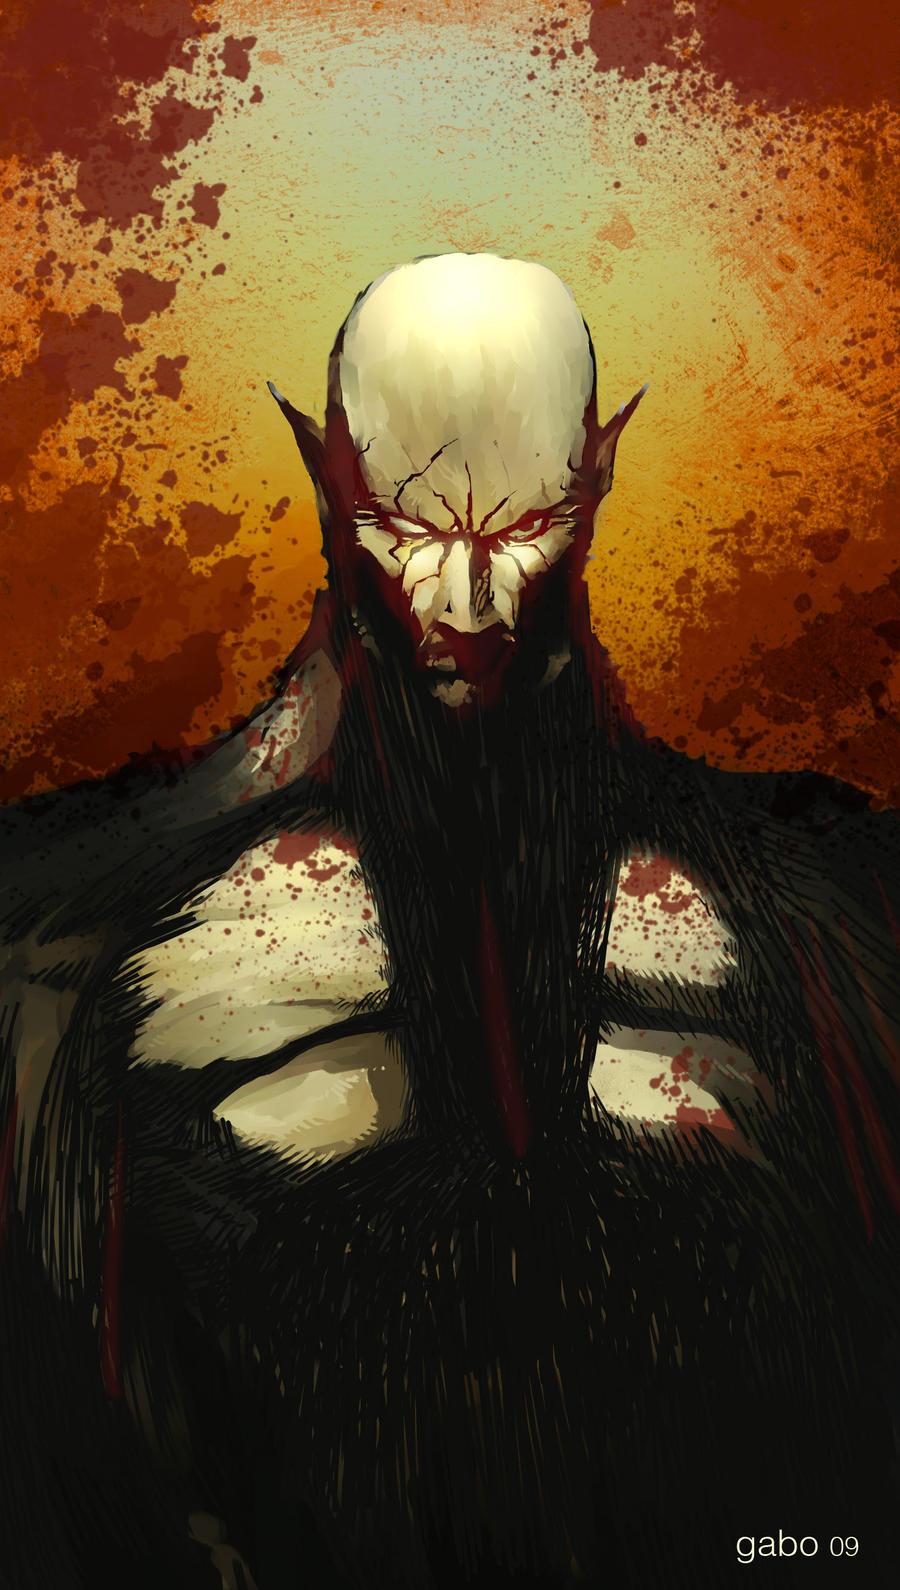 wampiro guapo by gabos